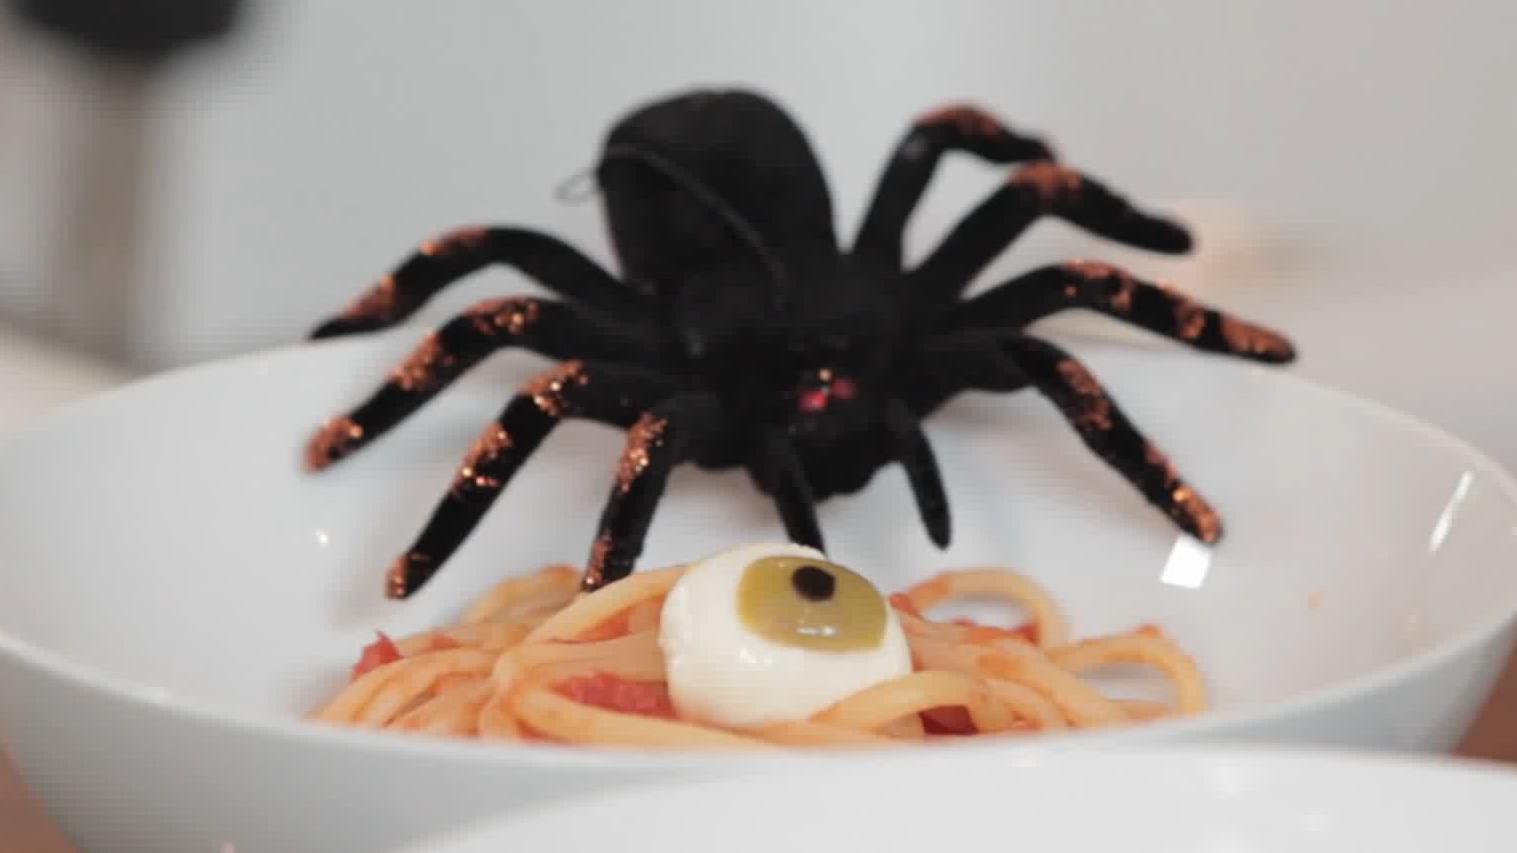 Eyeballs, Blood & Worms Pasta Recipe for Halloween